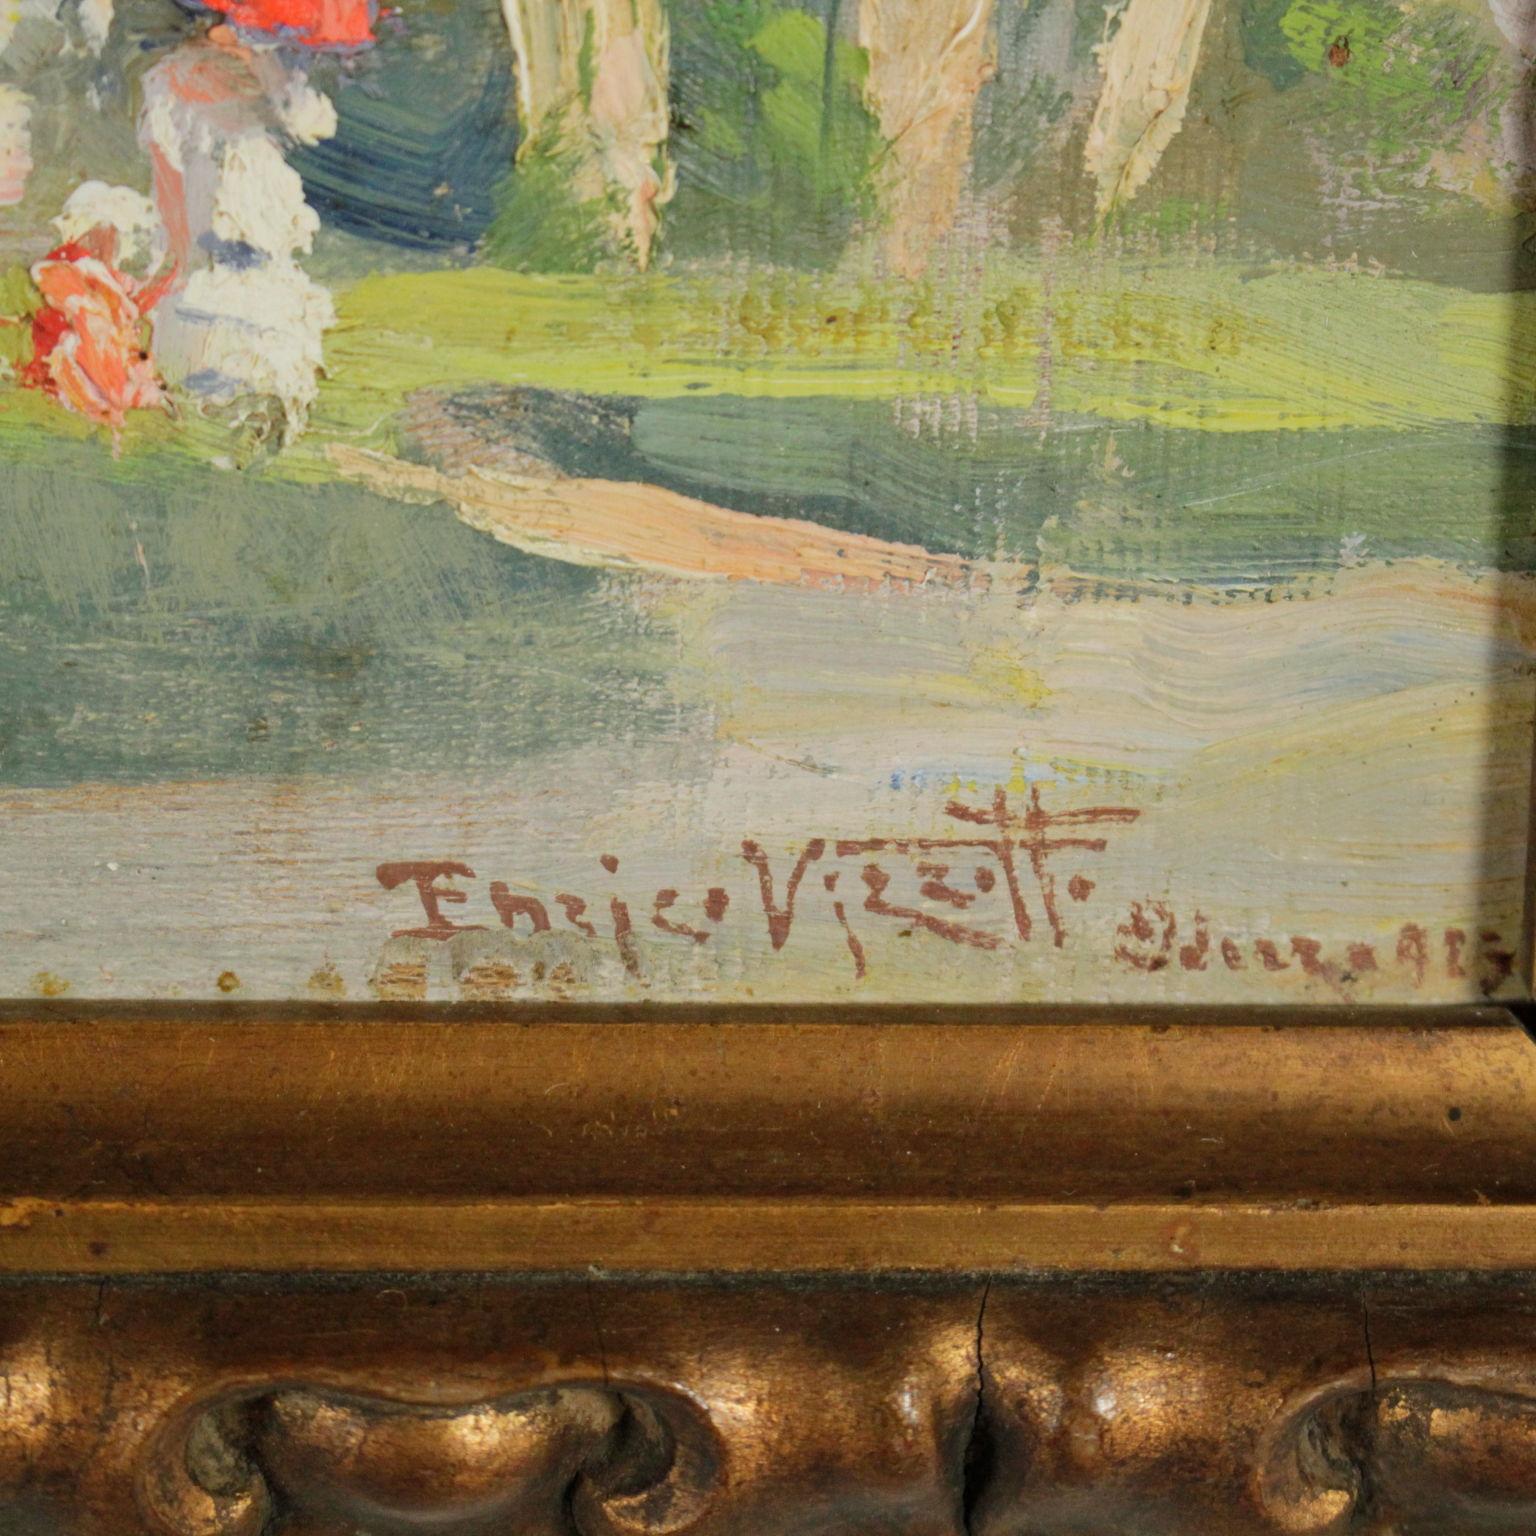 Enrico vizzotto veduta di giardino novecento arte - Arte e giardino ...